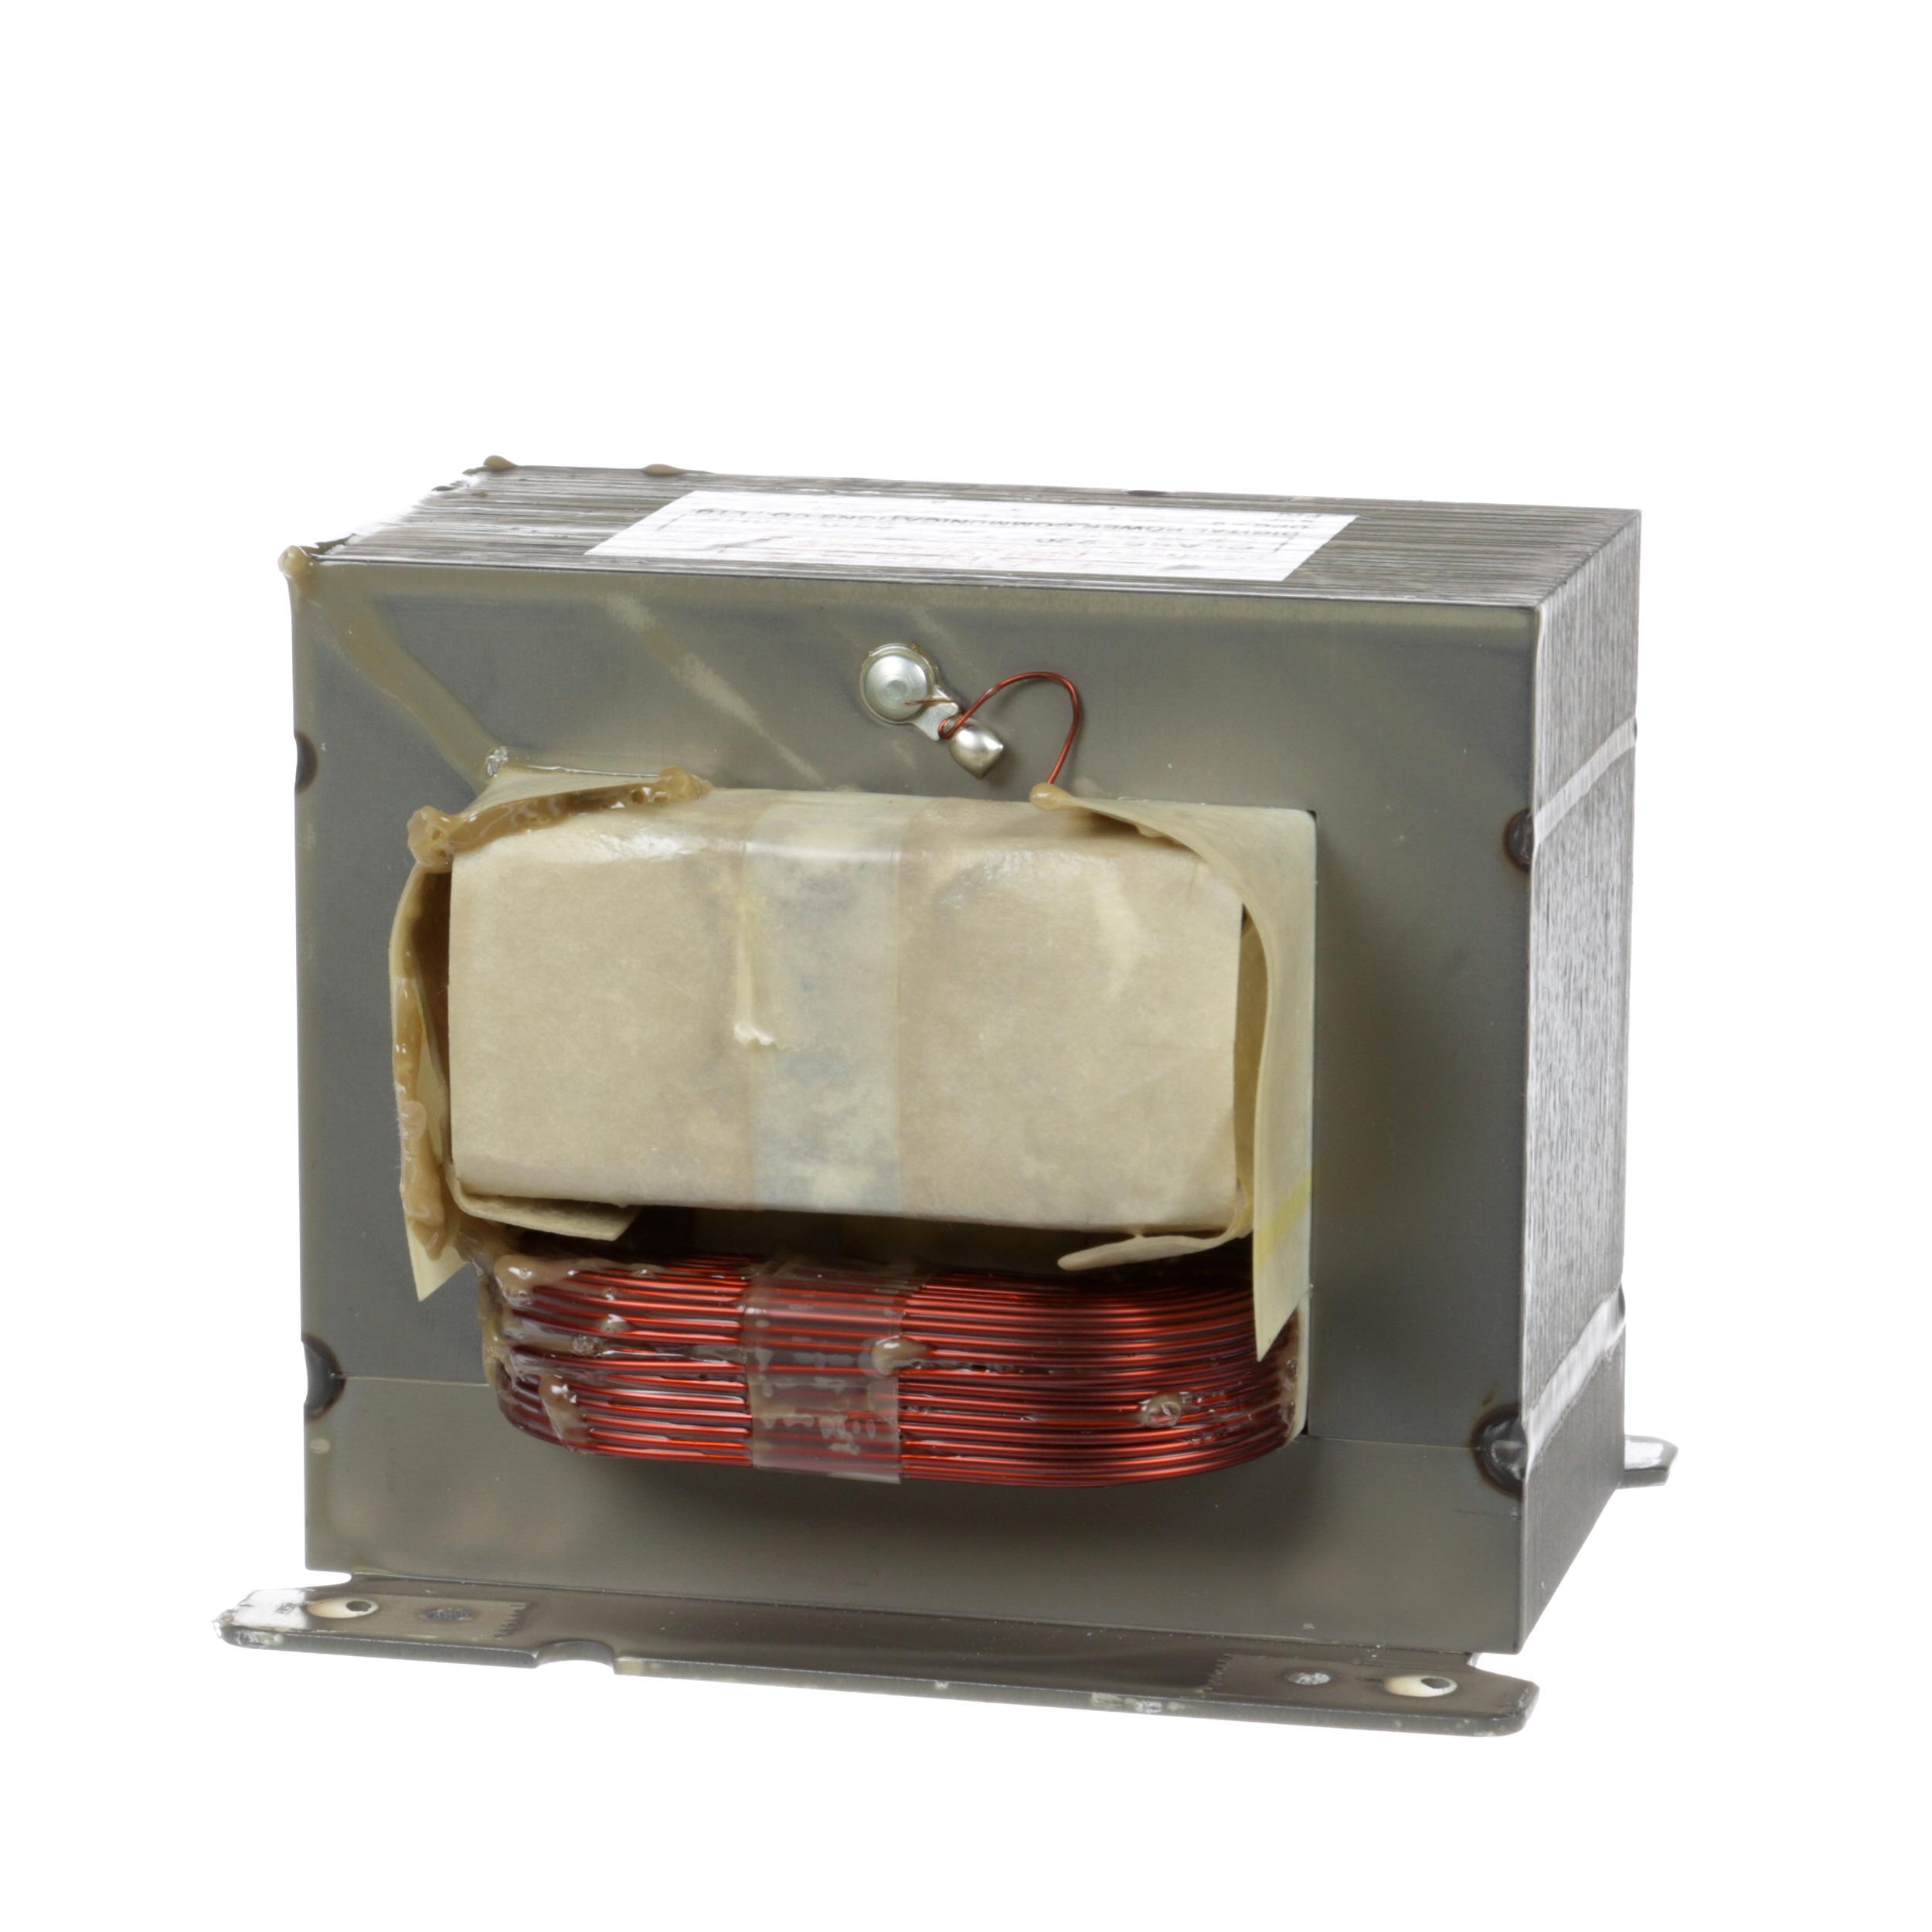 turbochef model 941-004 service manual